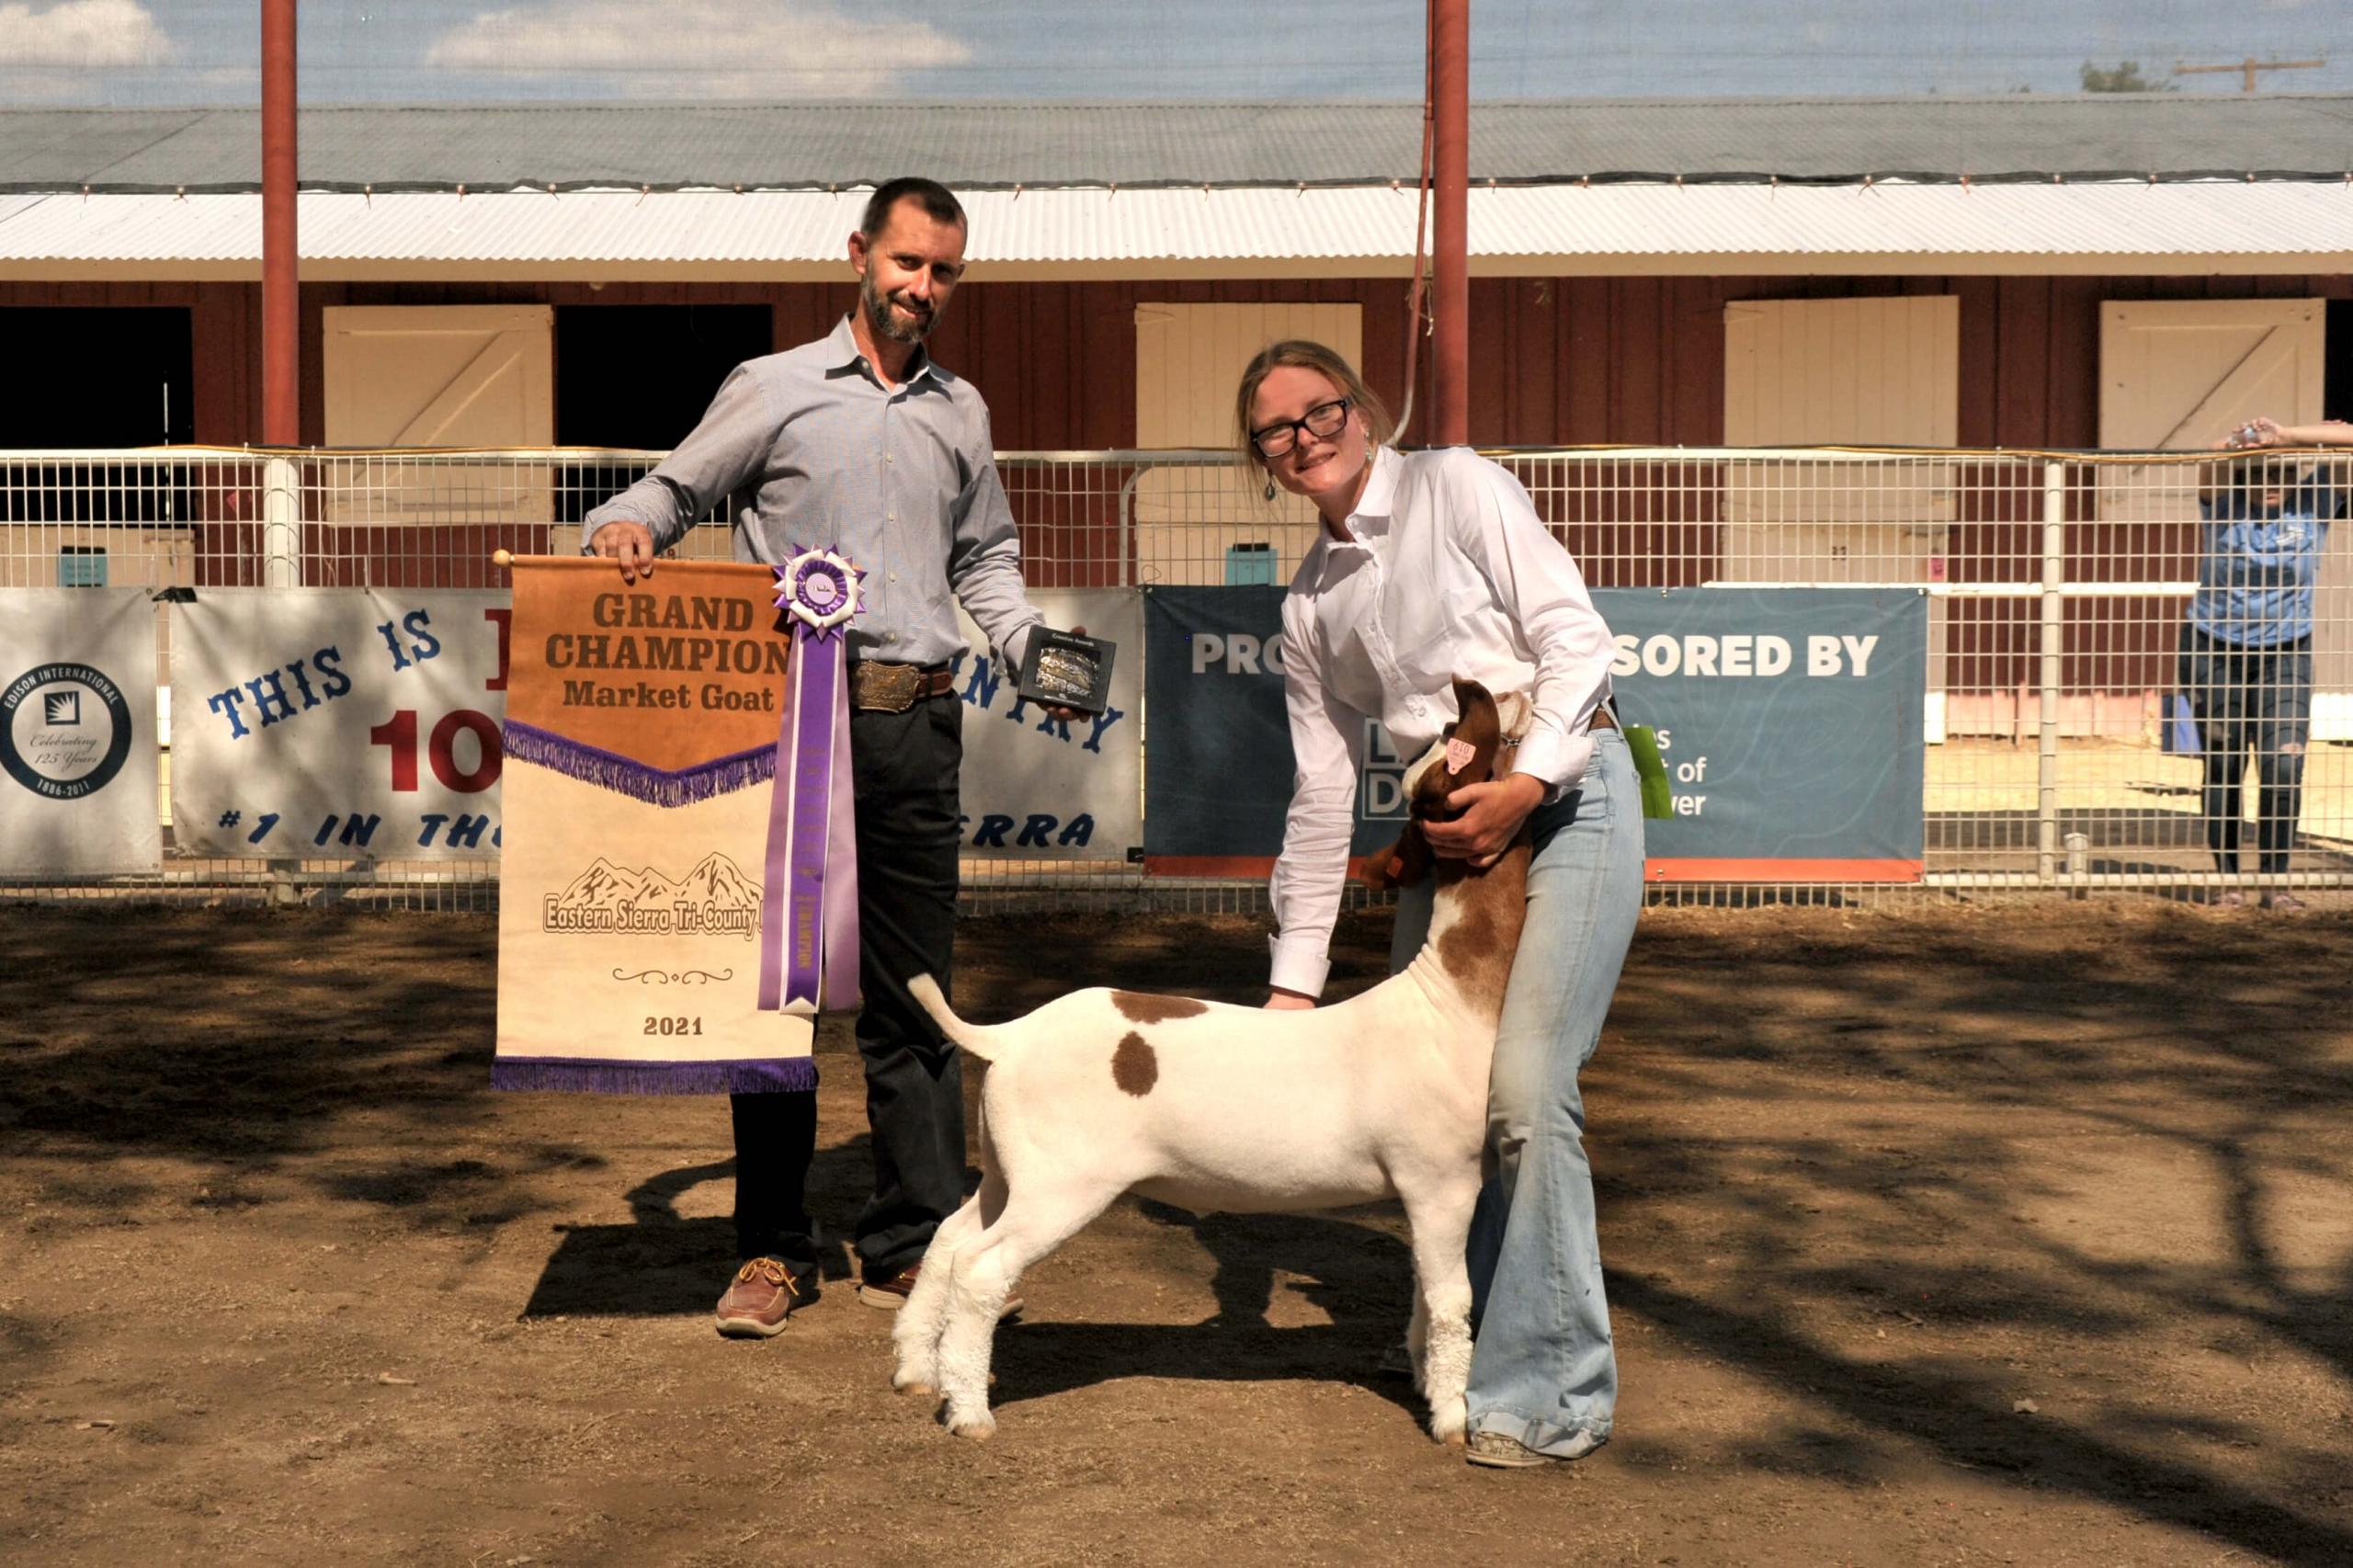 Kimberlin Alderman - Grand Champ Market Goat